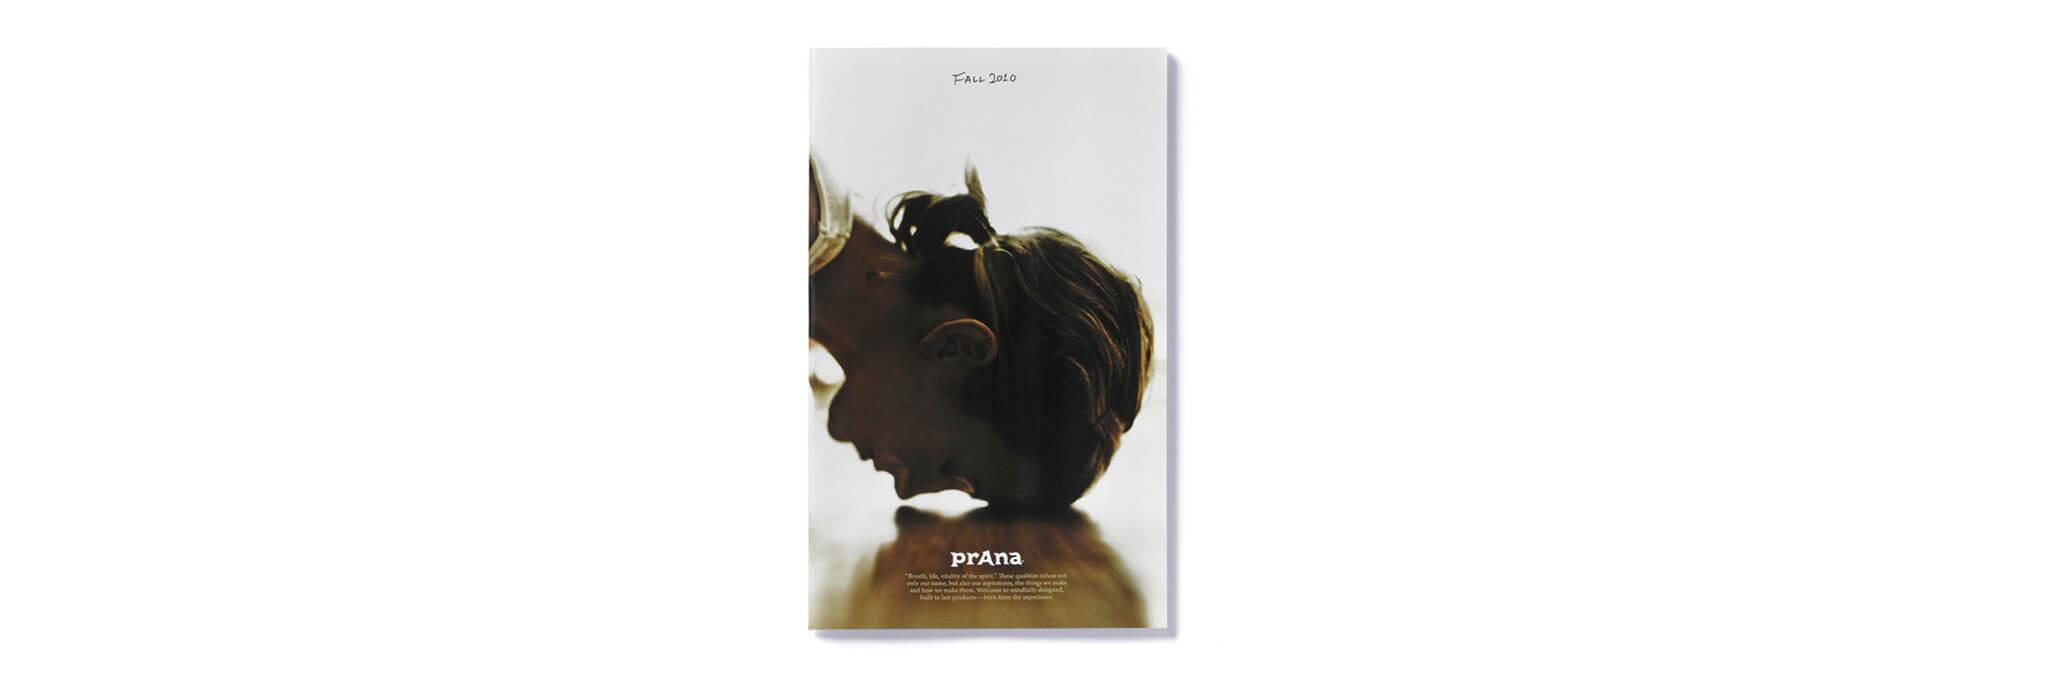 Prana catalog cover with yogi's forehead resting on floor